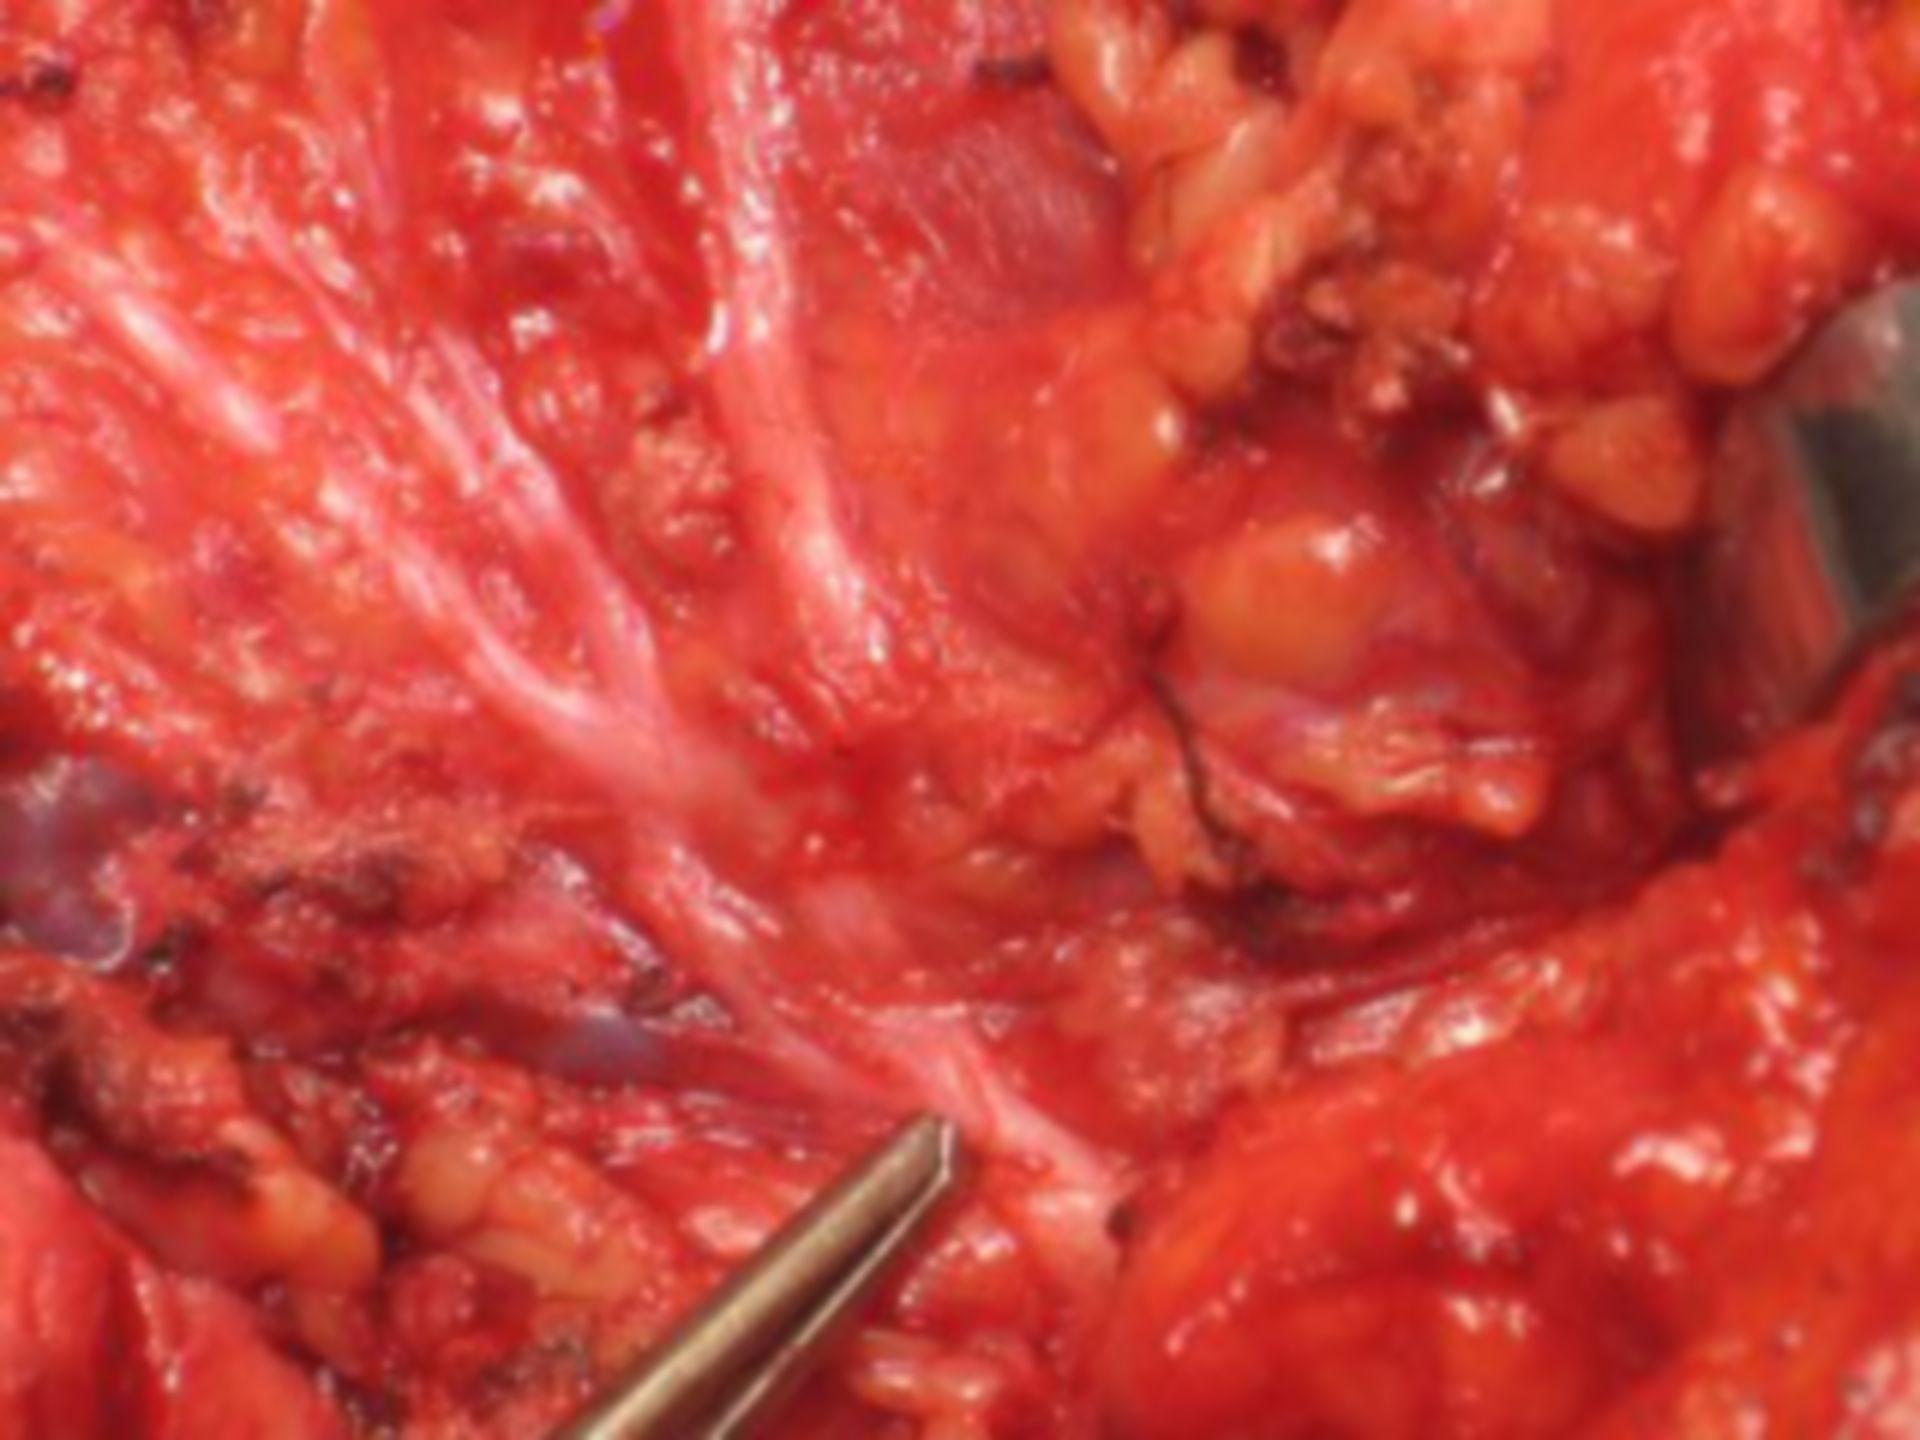 Surgery on the salivary gland (pic3)